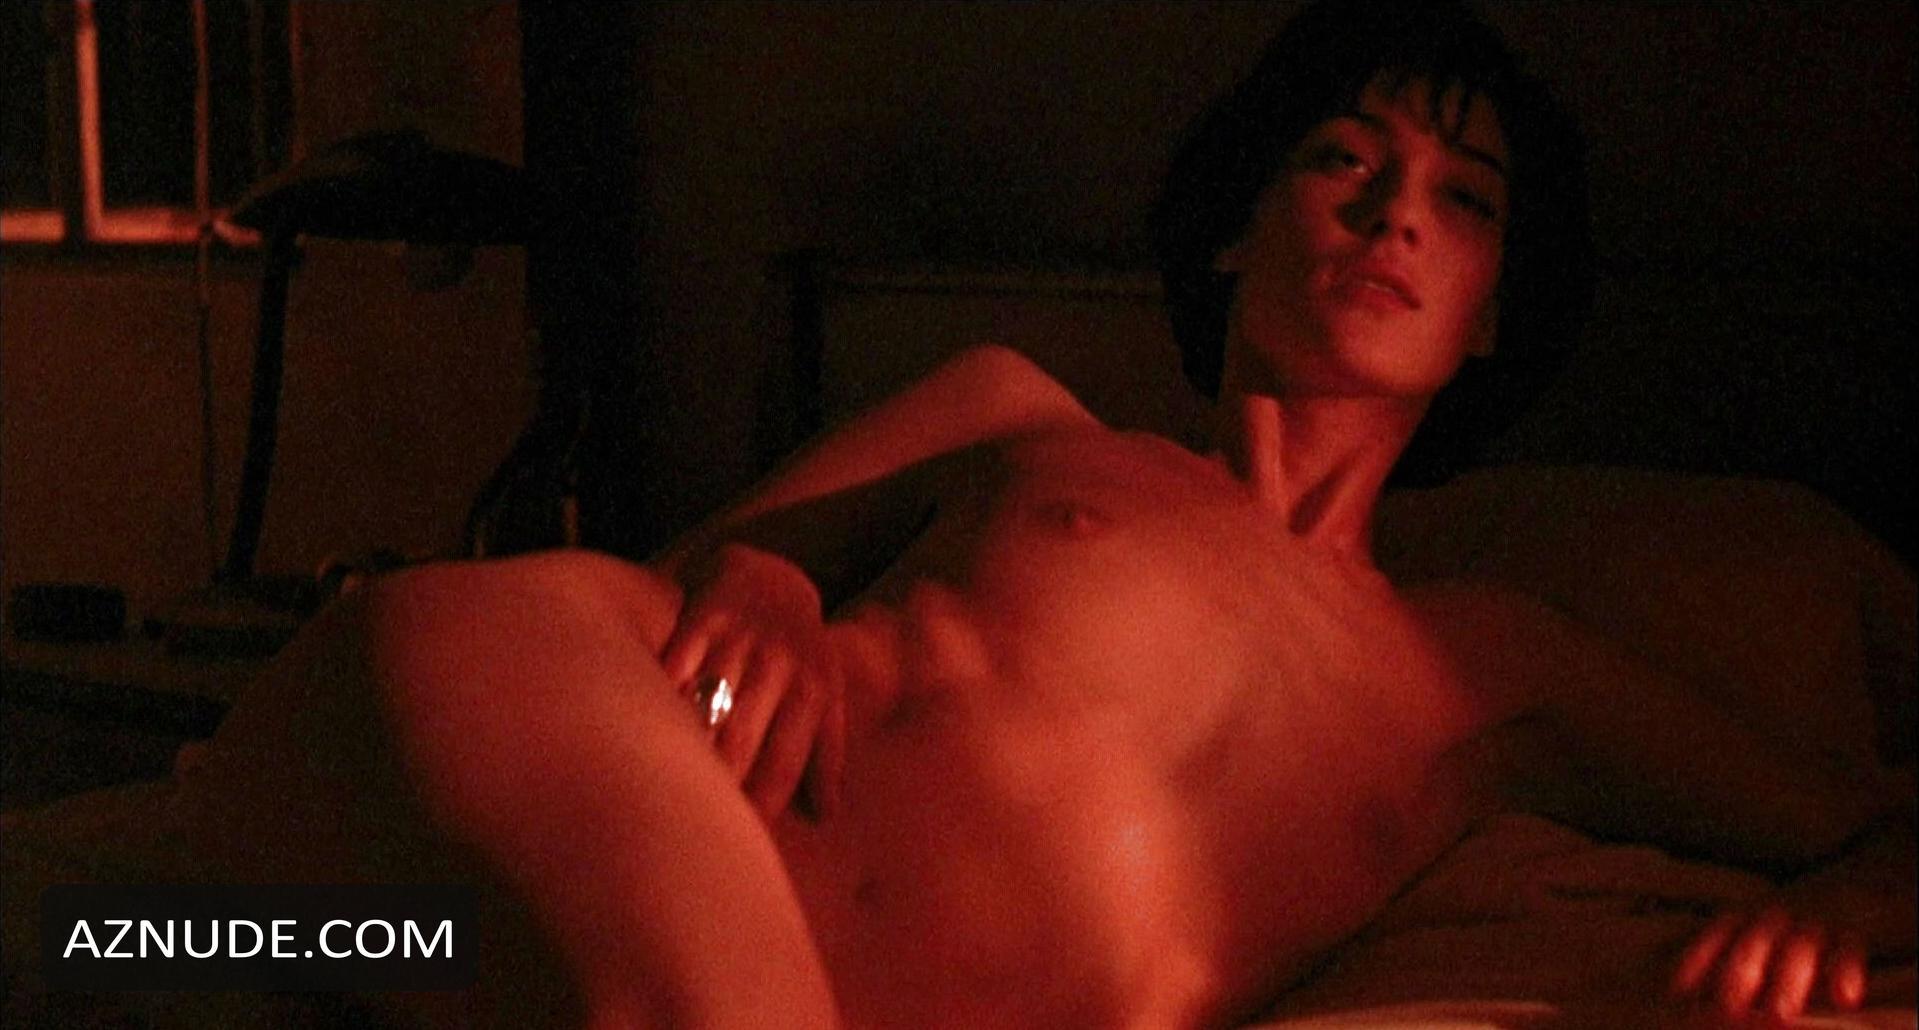 nude-mexican-nekedsex-sine-photo-dial-porn